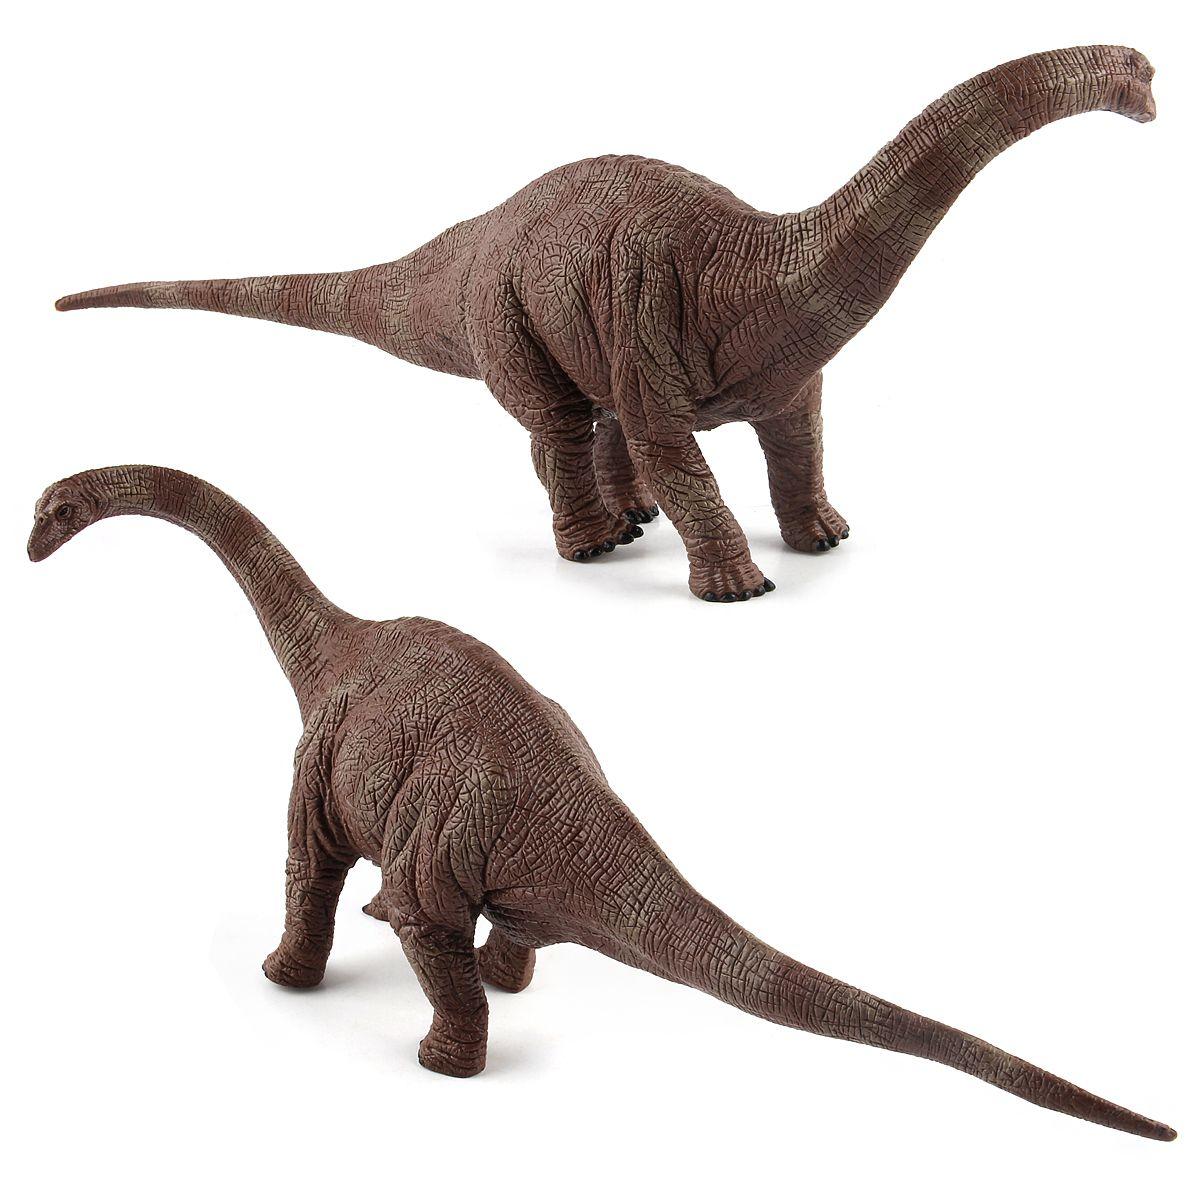 Realistic Animal Model Animal Toys Jurassic World Toys Dinosaurs